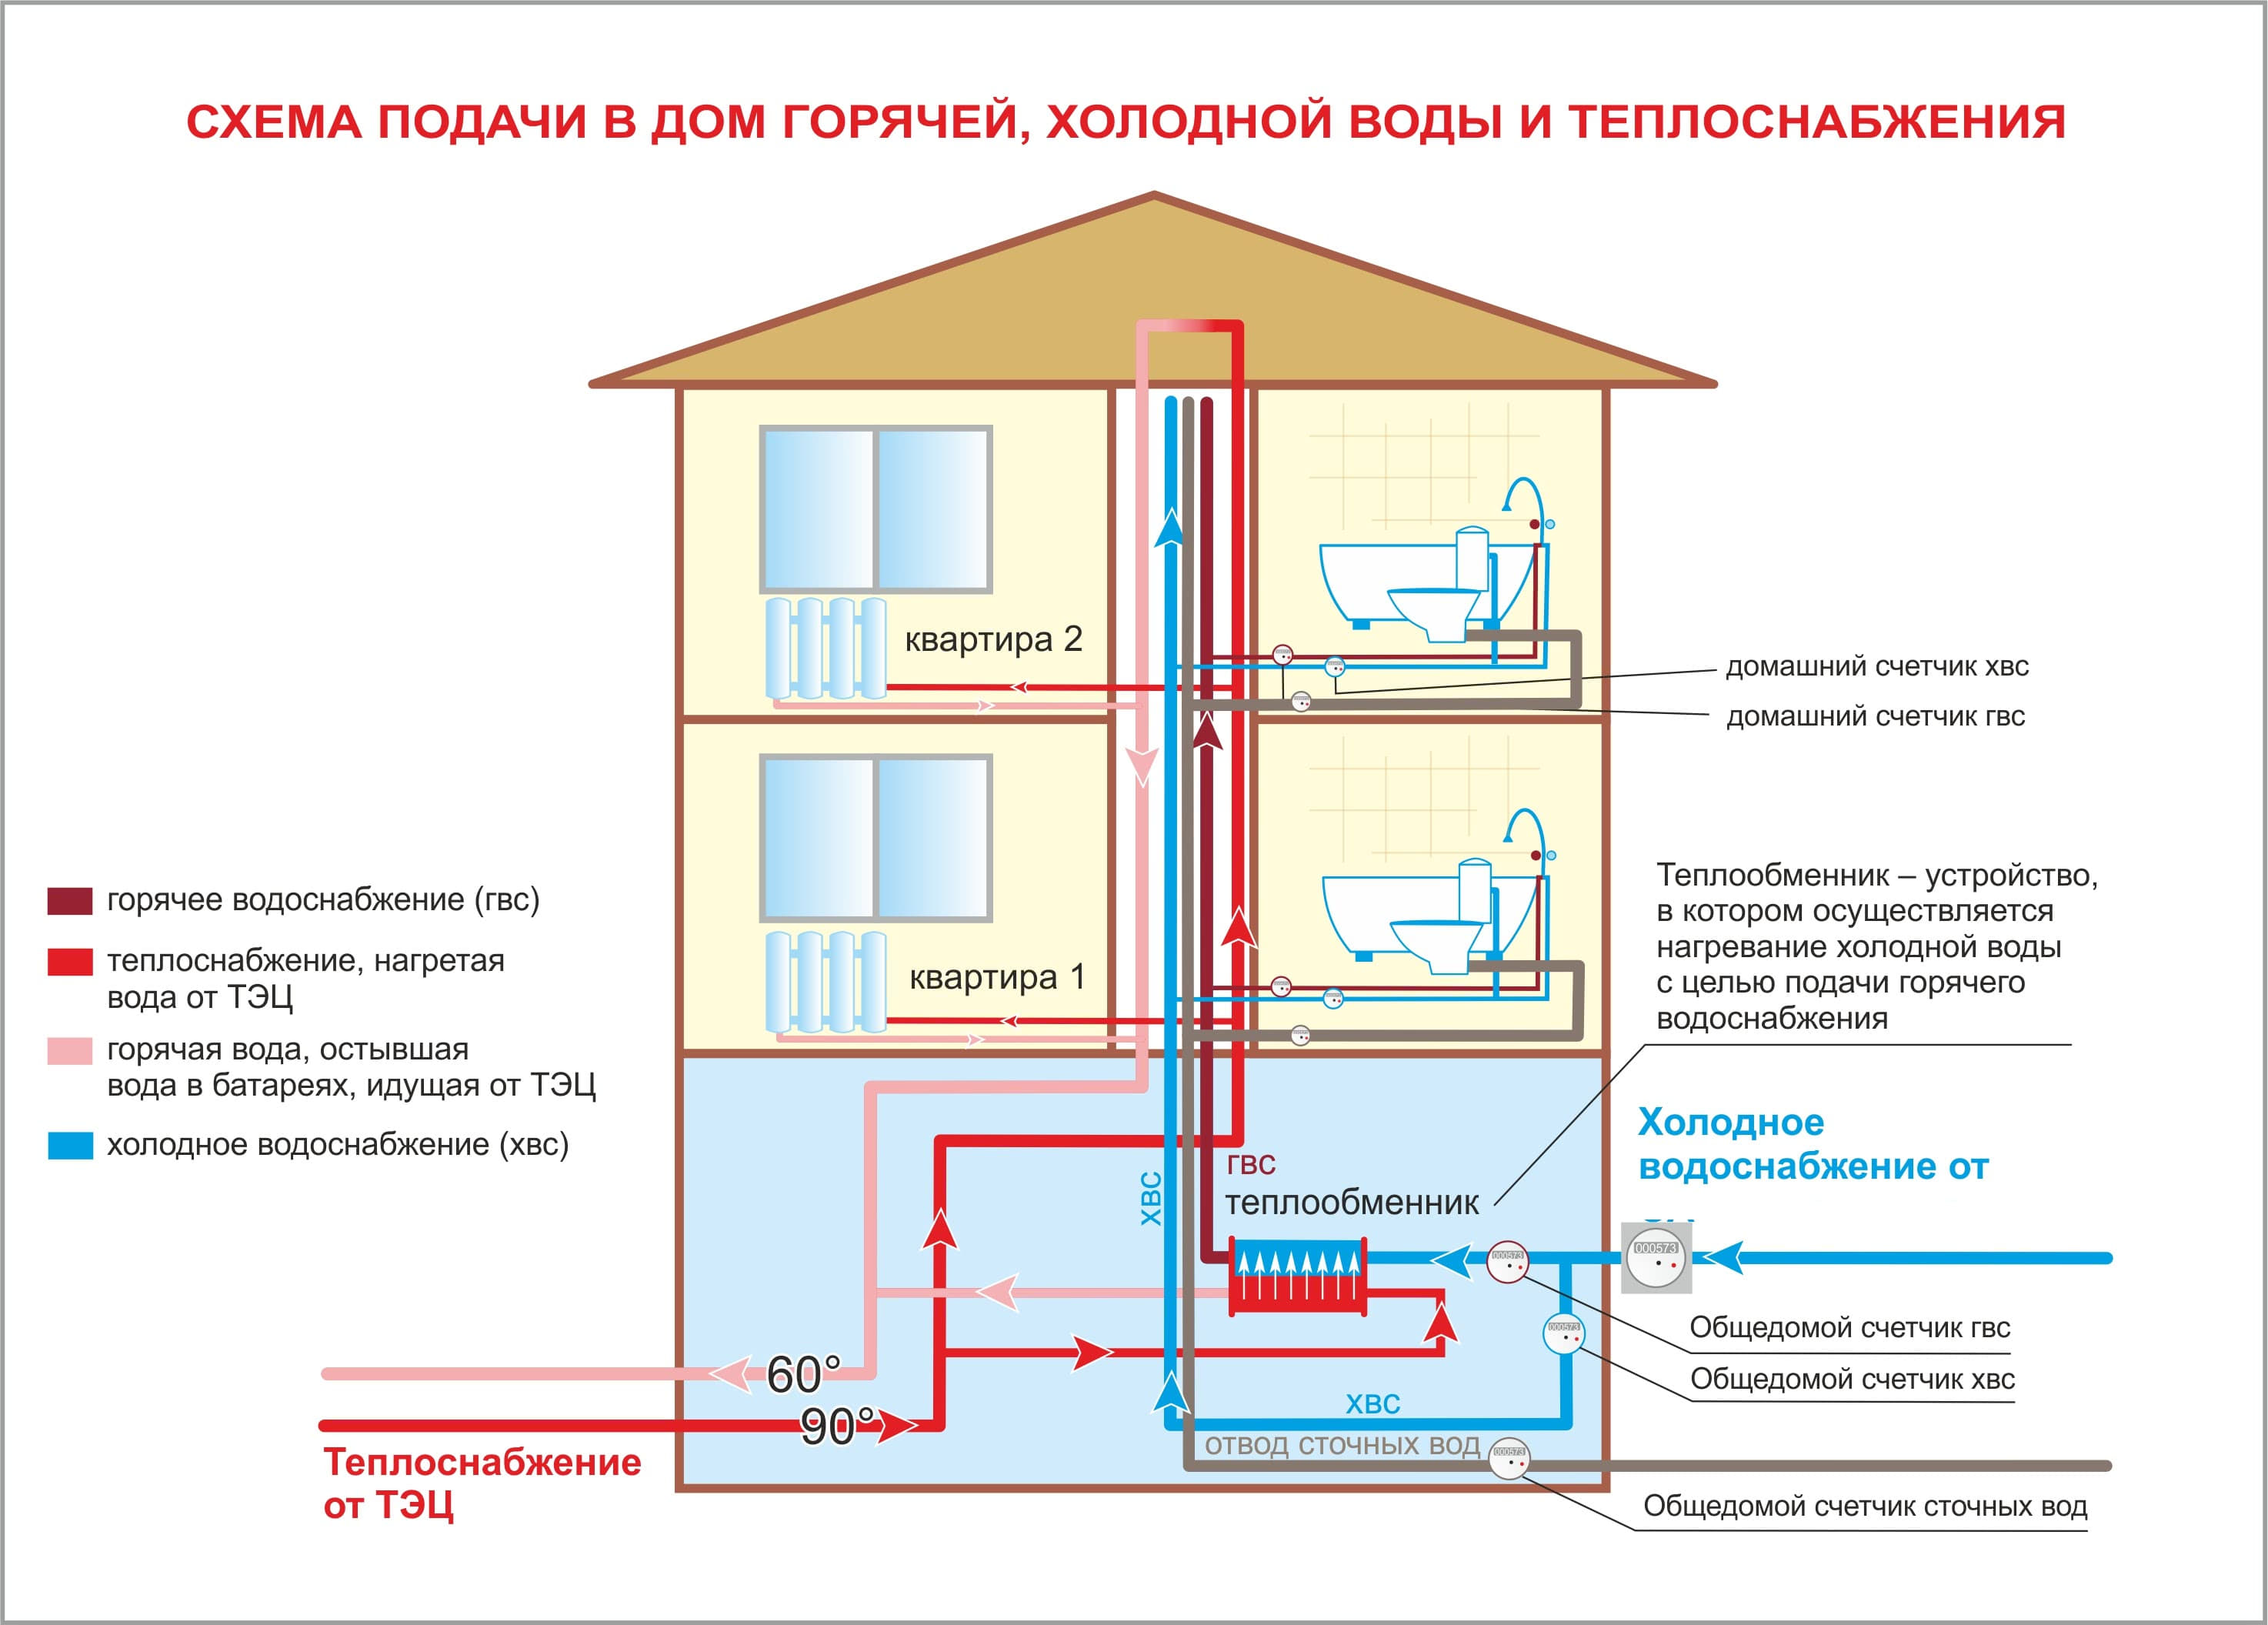 <a href='https://sanitarywork.ru/text/razdel-iii-vodosnabzhenie/80-shemi-gorodskogo-vodosnabzheniya' target='_blank' rel='external'>Схема водоснабжения</a> и водоотведения